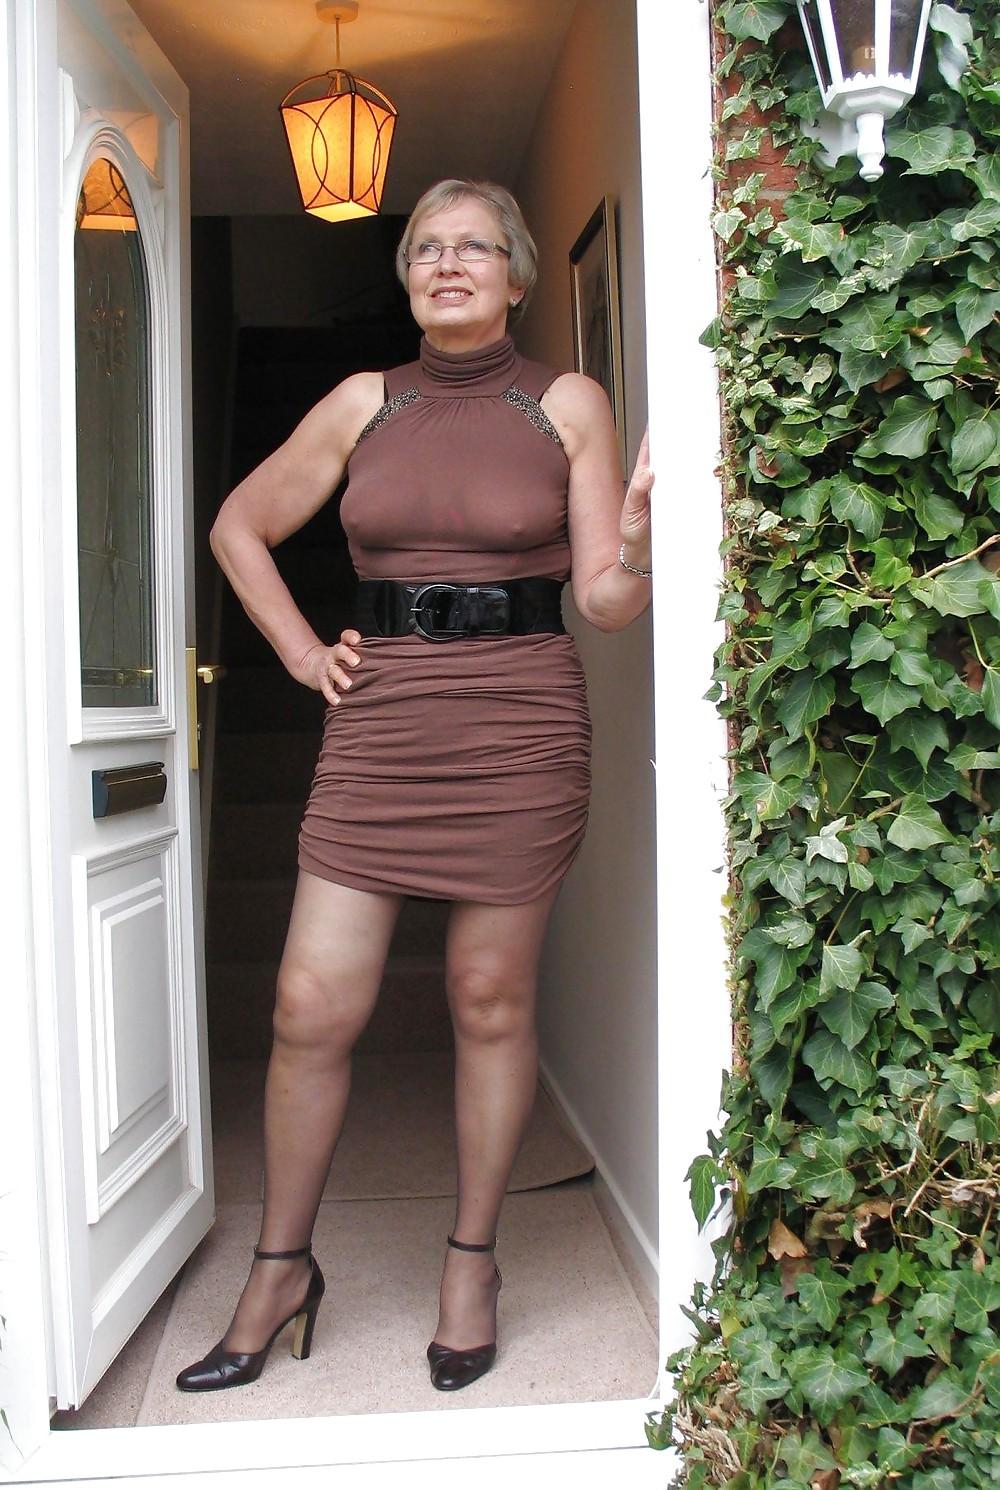 Mature women in dresses galleries